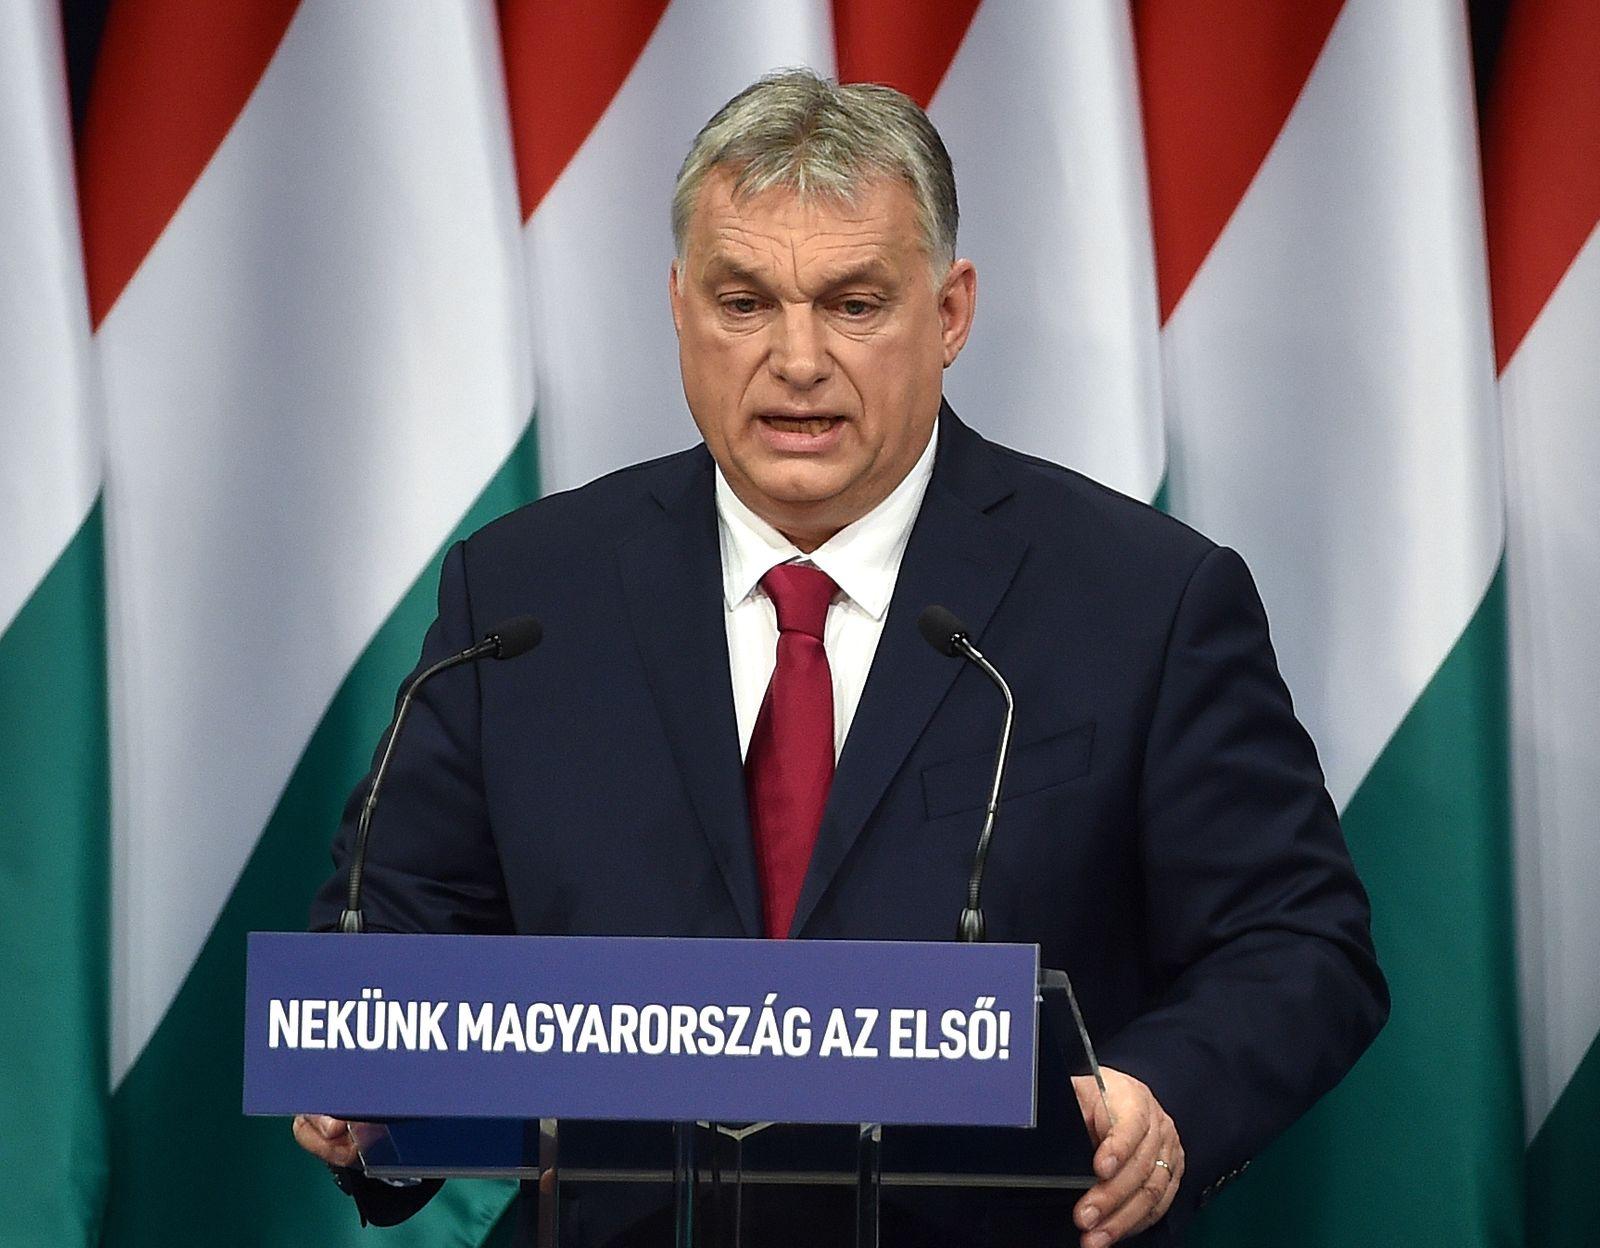 HUNGARY-POLITICS-ORBAN-NATION-SPEECH